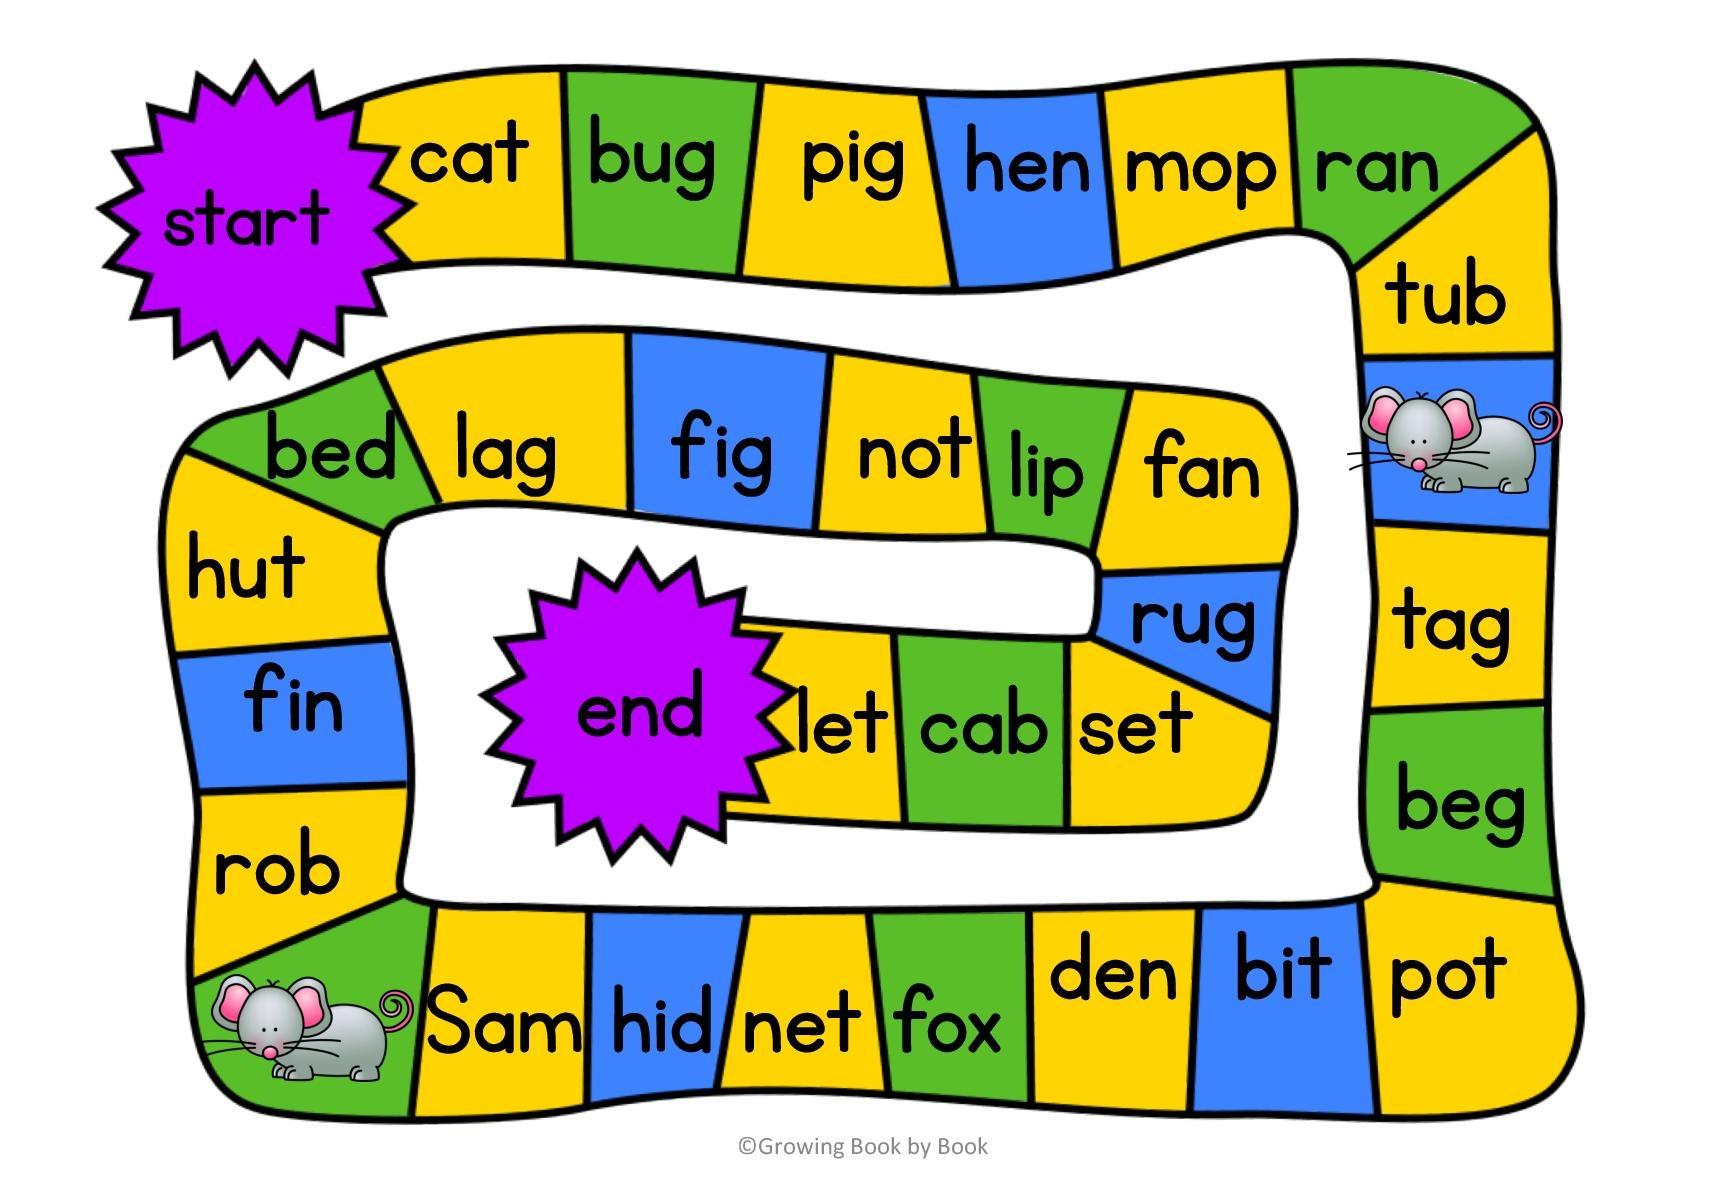 3 Free Printable Cvc Word Games - Free Printable Word Games